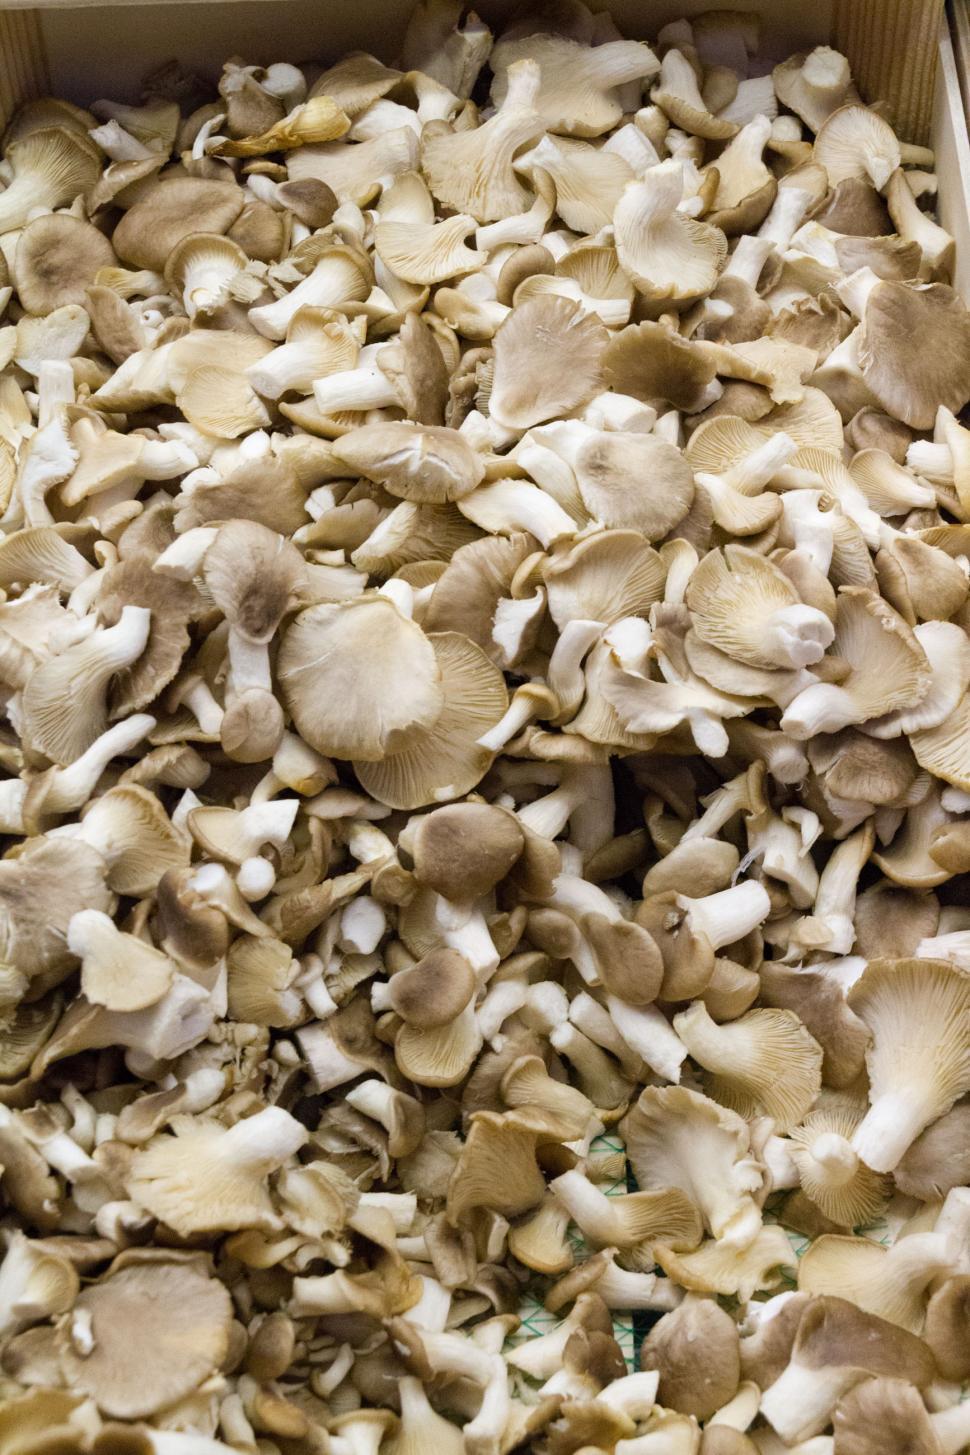 Shiitake mushrooms in a box